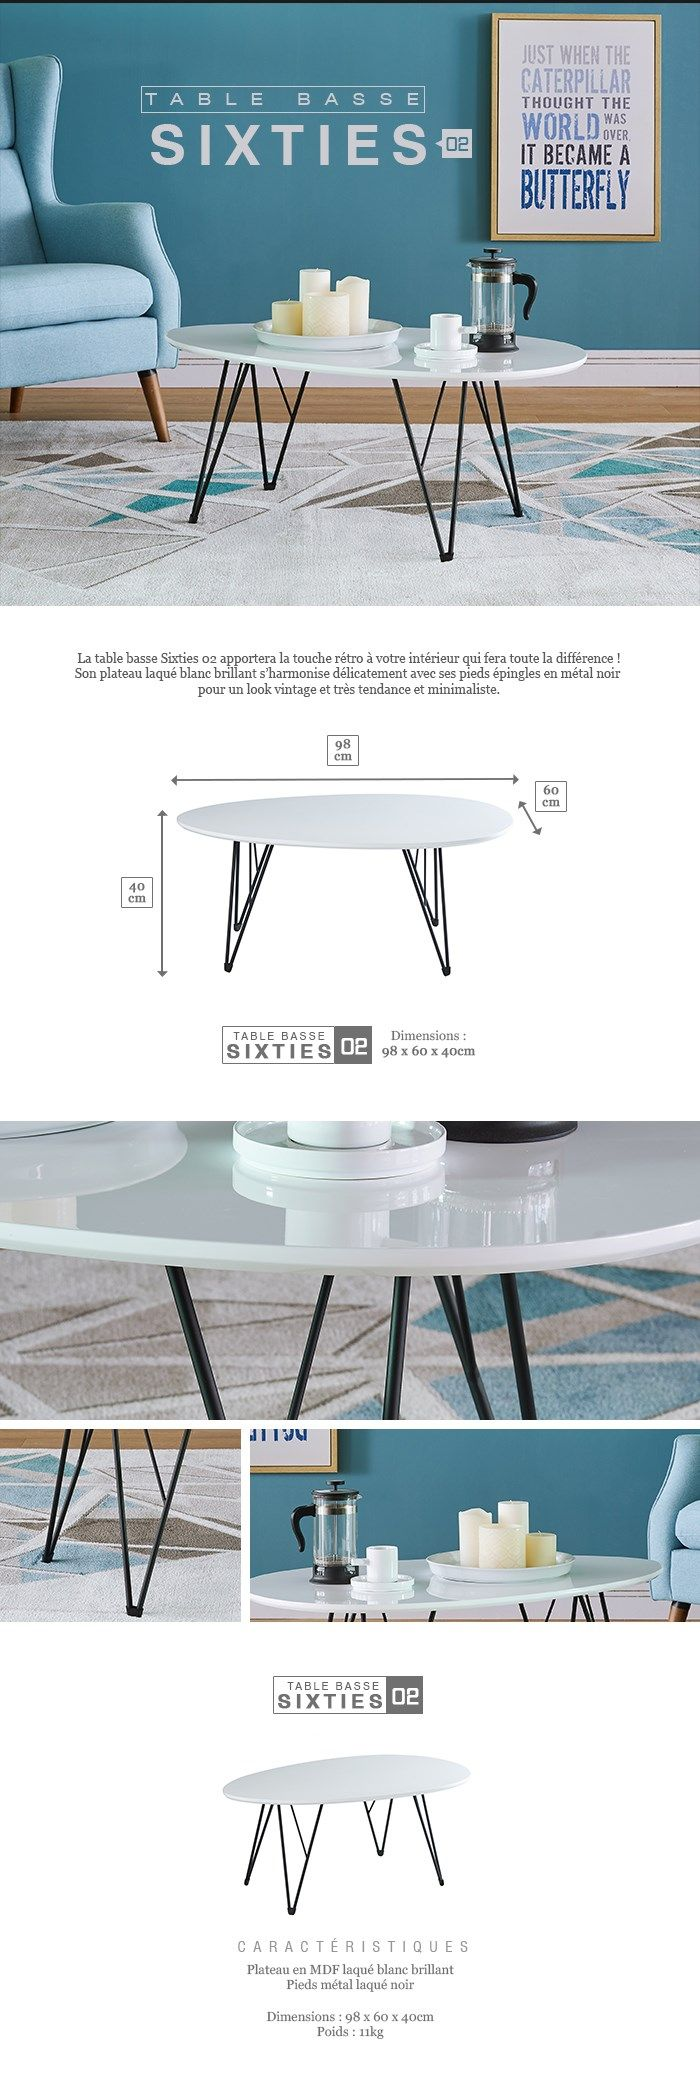 Difference Blanc Brillant Et Blanc Laqué tables basses vintages | meuble, table basse, table basse